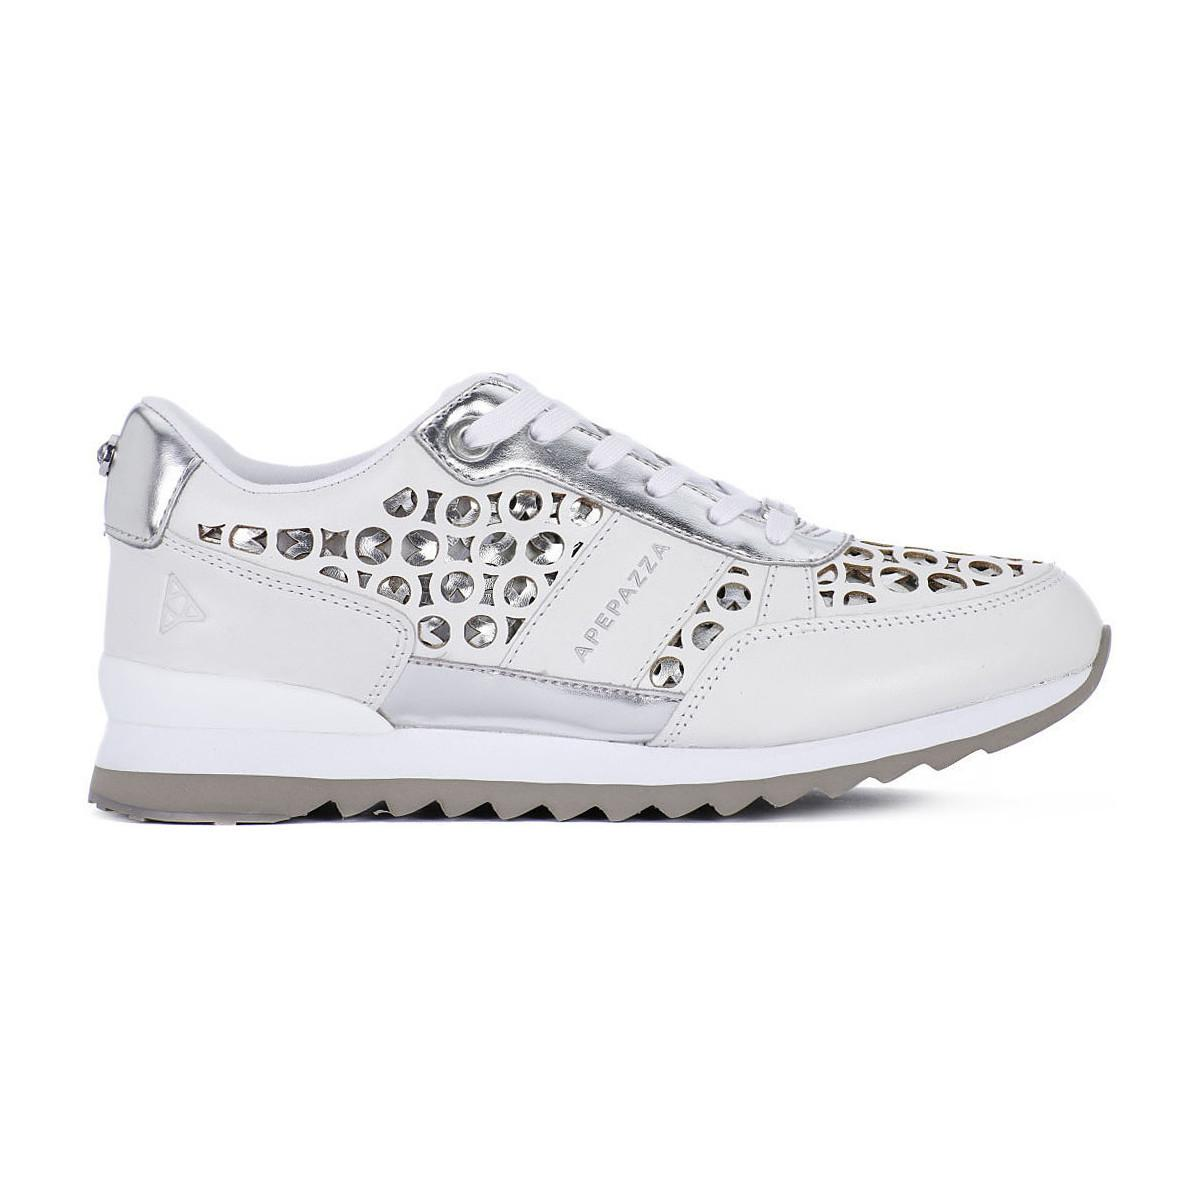 Apepazza Dauphine Women's Shoes (trainers) In White